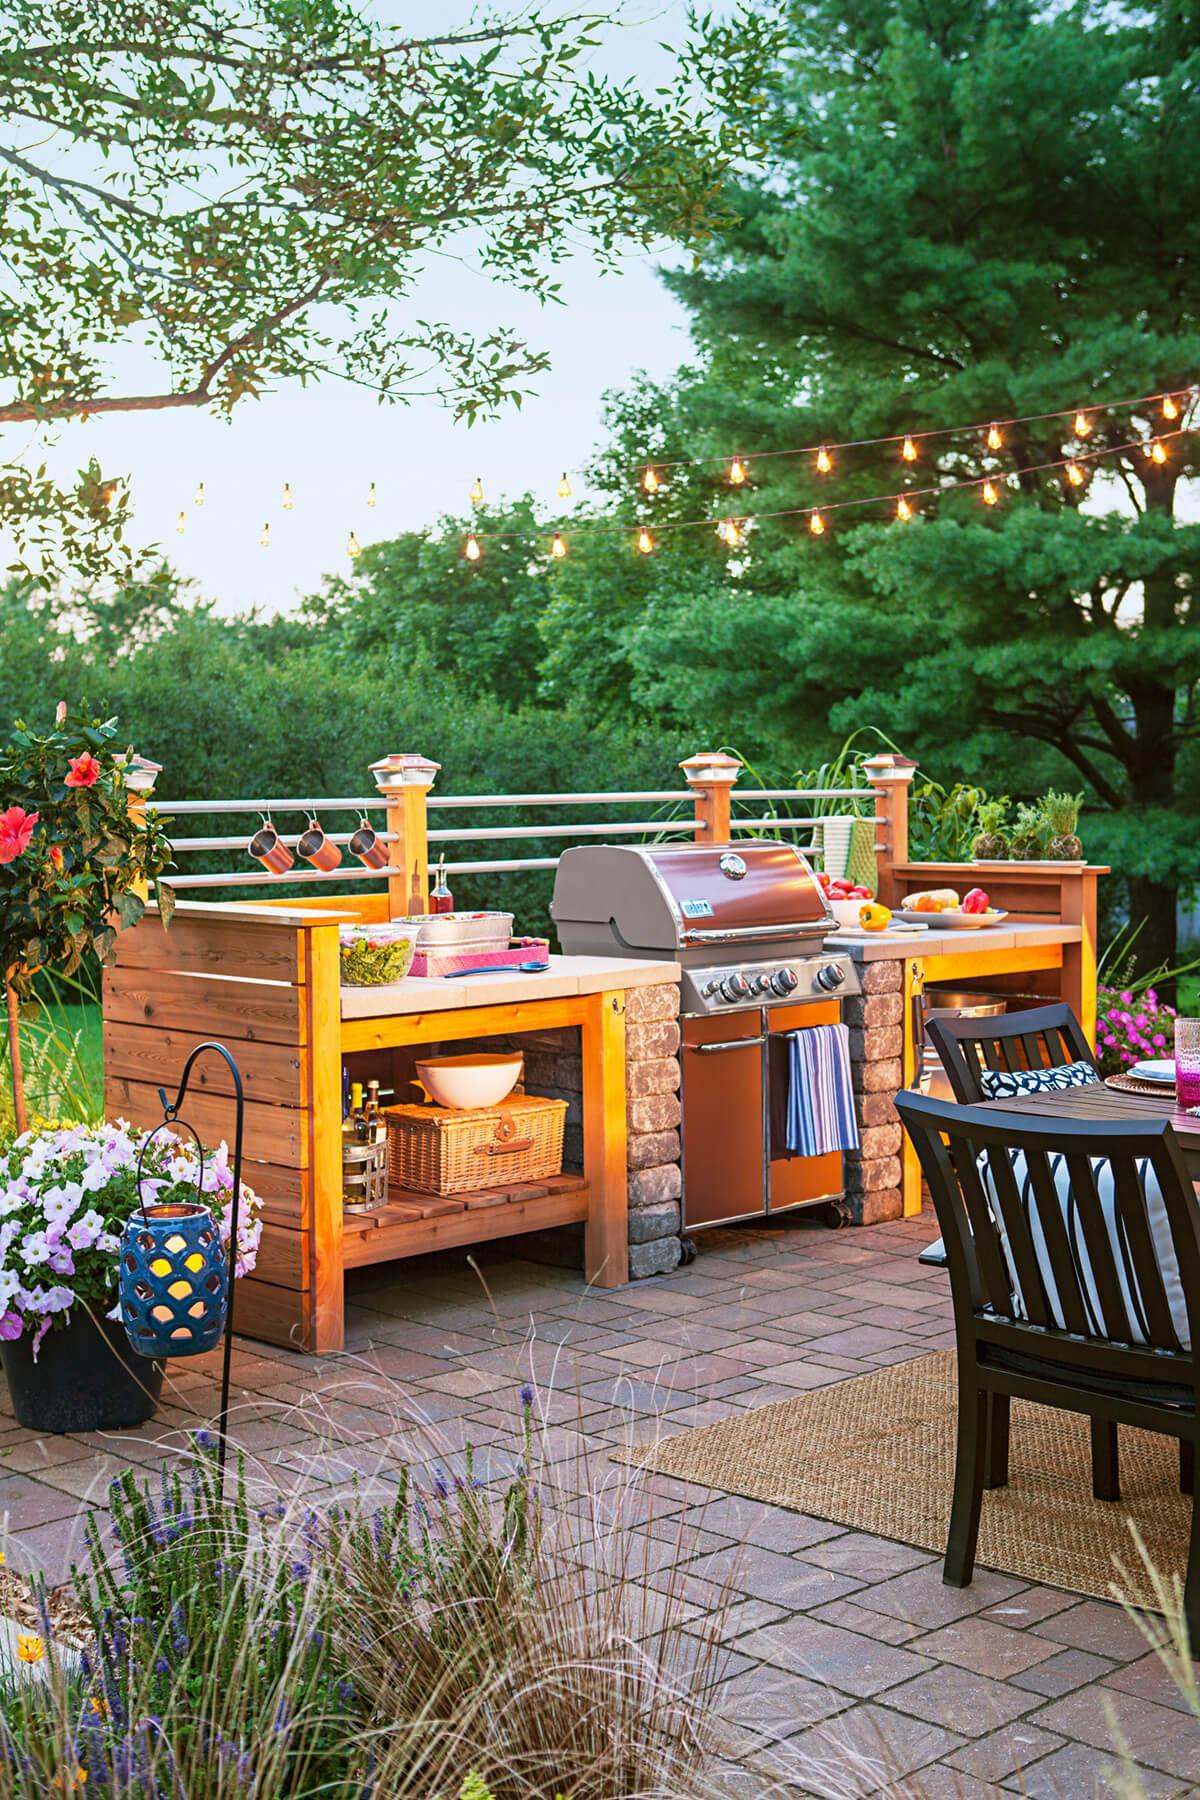 Outdoor Kitchen Prep Station  27 Best Outdoor Kitchen Ideas and Designs for 2020